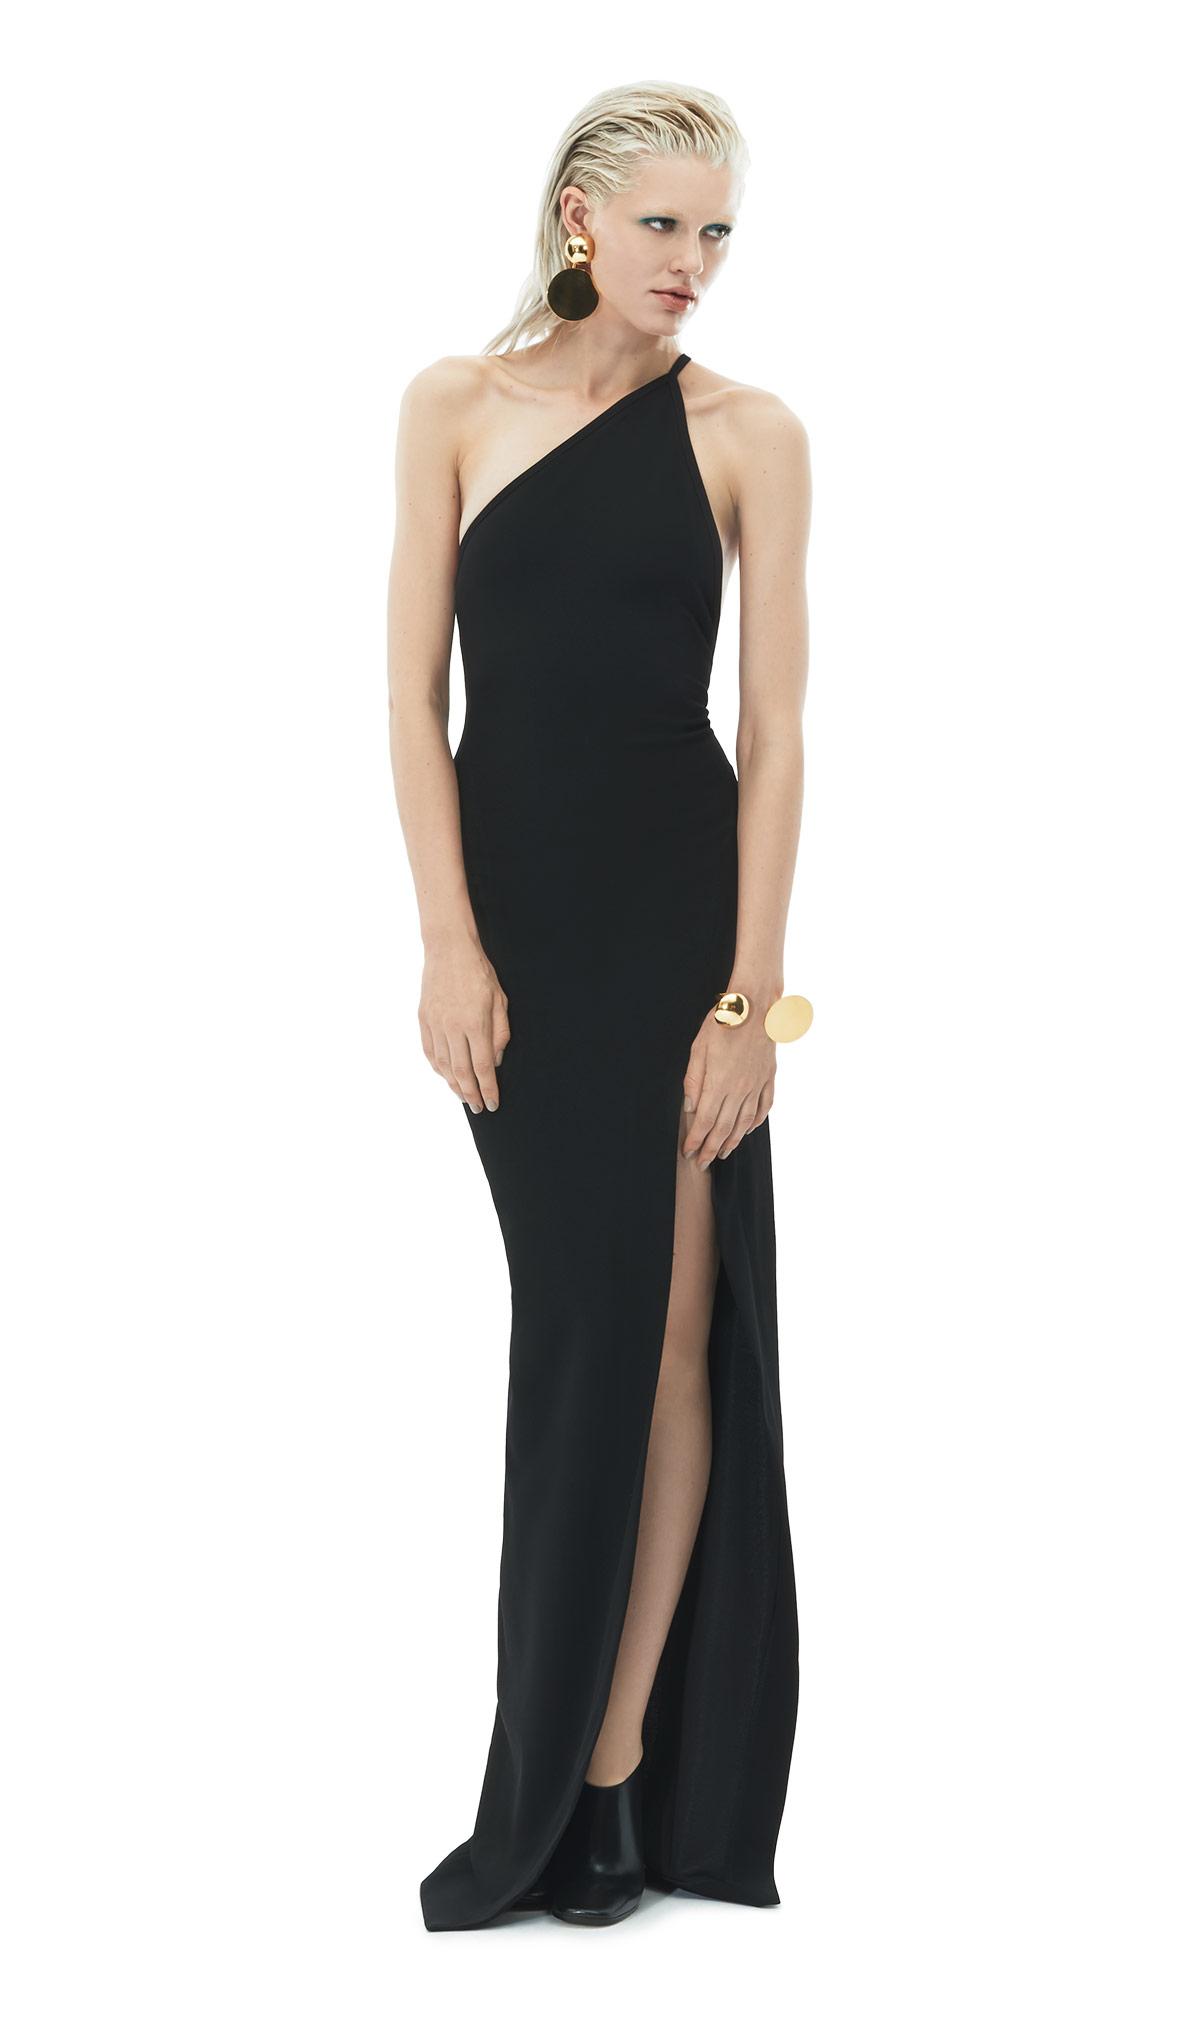 59674e6e664 Solace London Petch One-Shoulder Crepe Maxi Dress in Black - Lyst